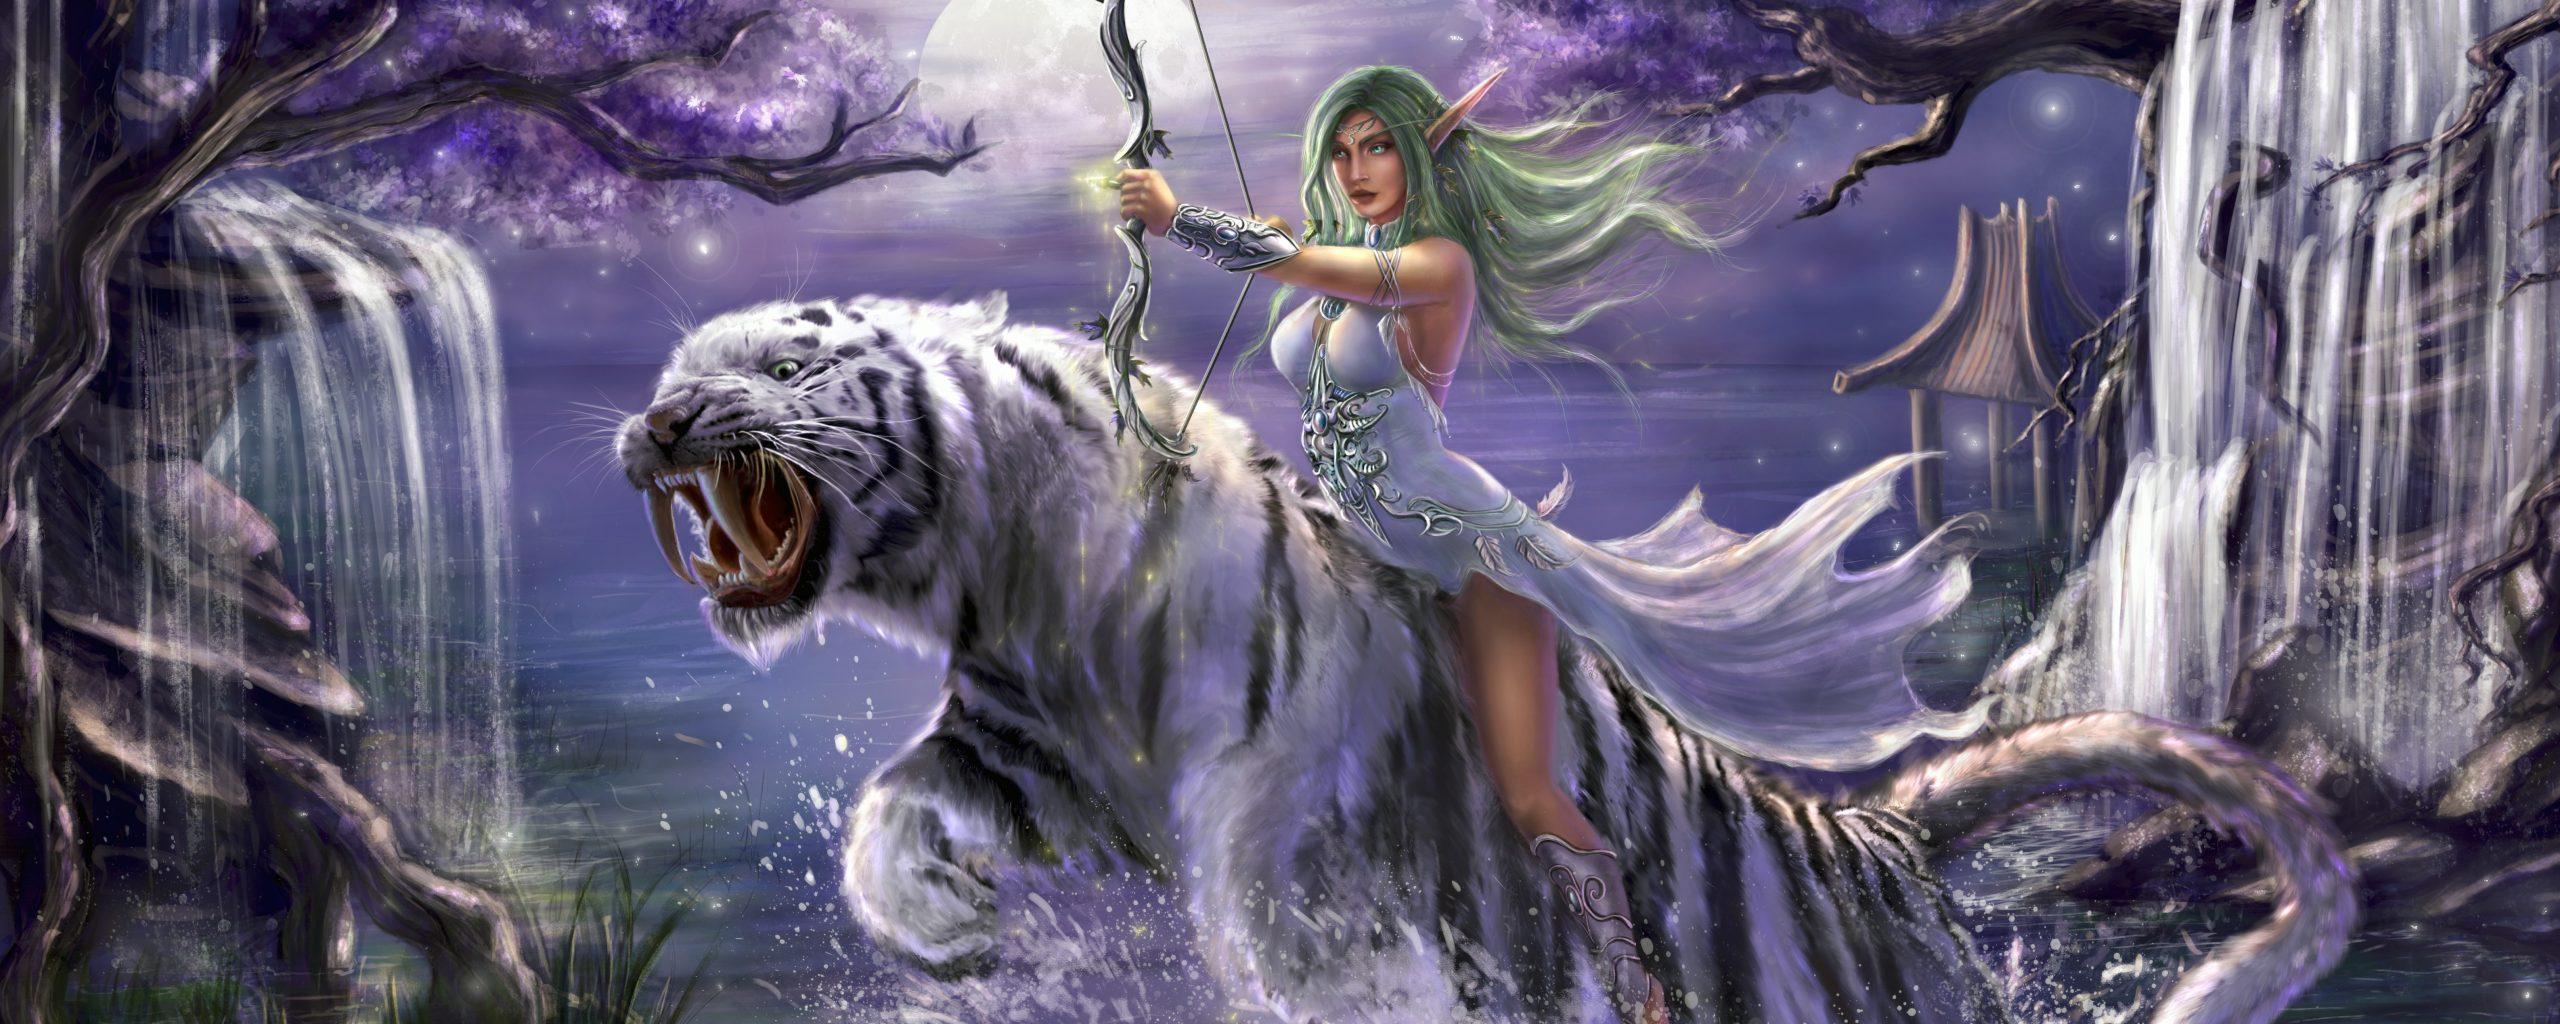 World Of Warcraft The Dark Portal Uhd 4k Wallpaper: Tyrande Whisperwind World Of Warcraft 5K Wallpaper